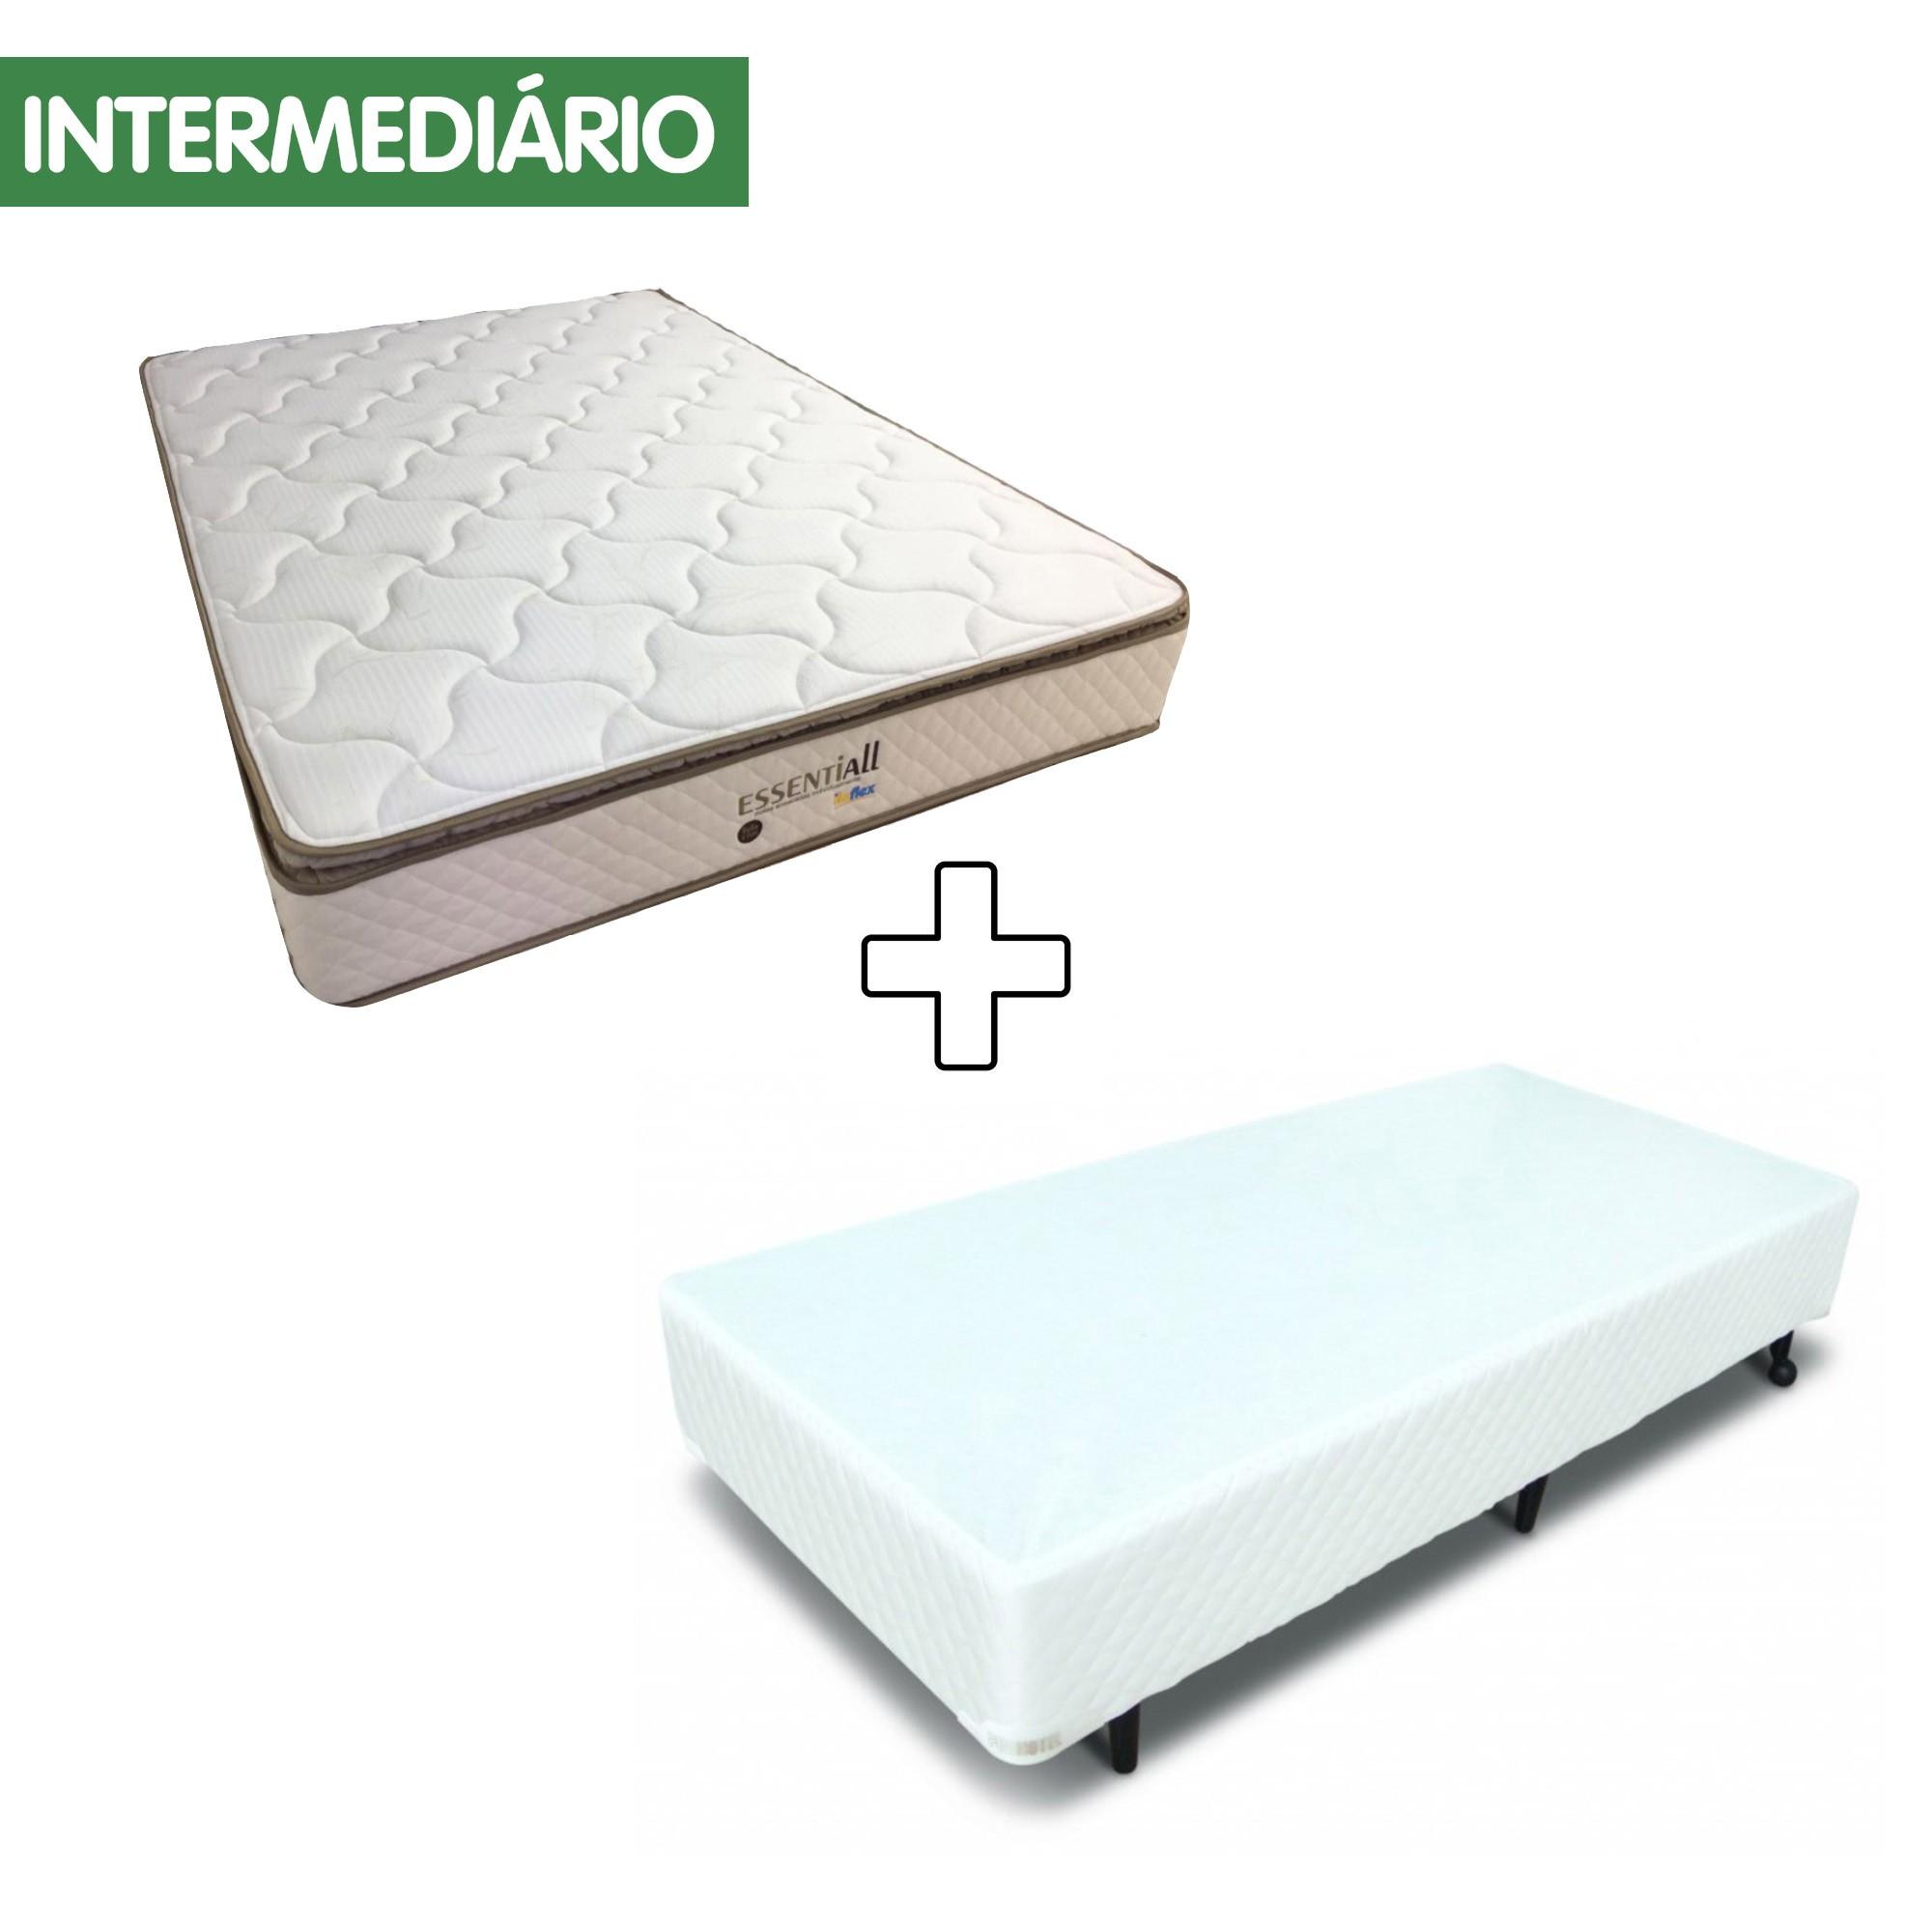 Conjunto Box MGA Itaflex Essentiall [Viúva 128 x 188 cm]